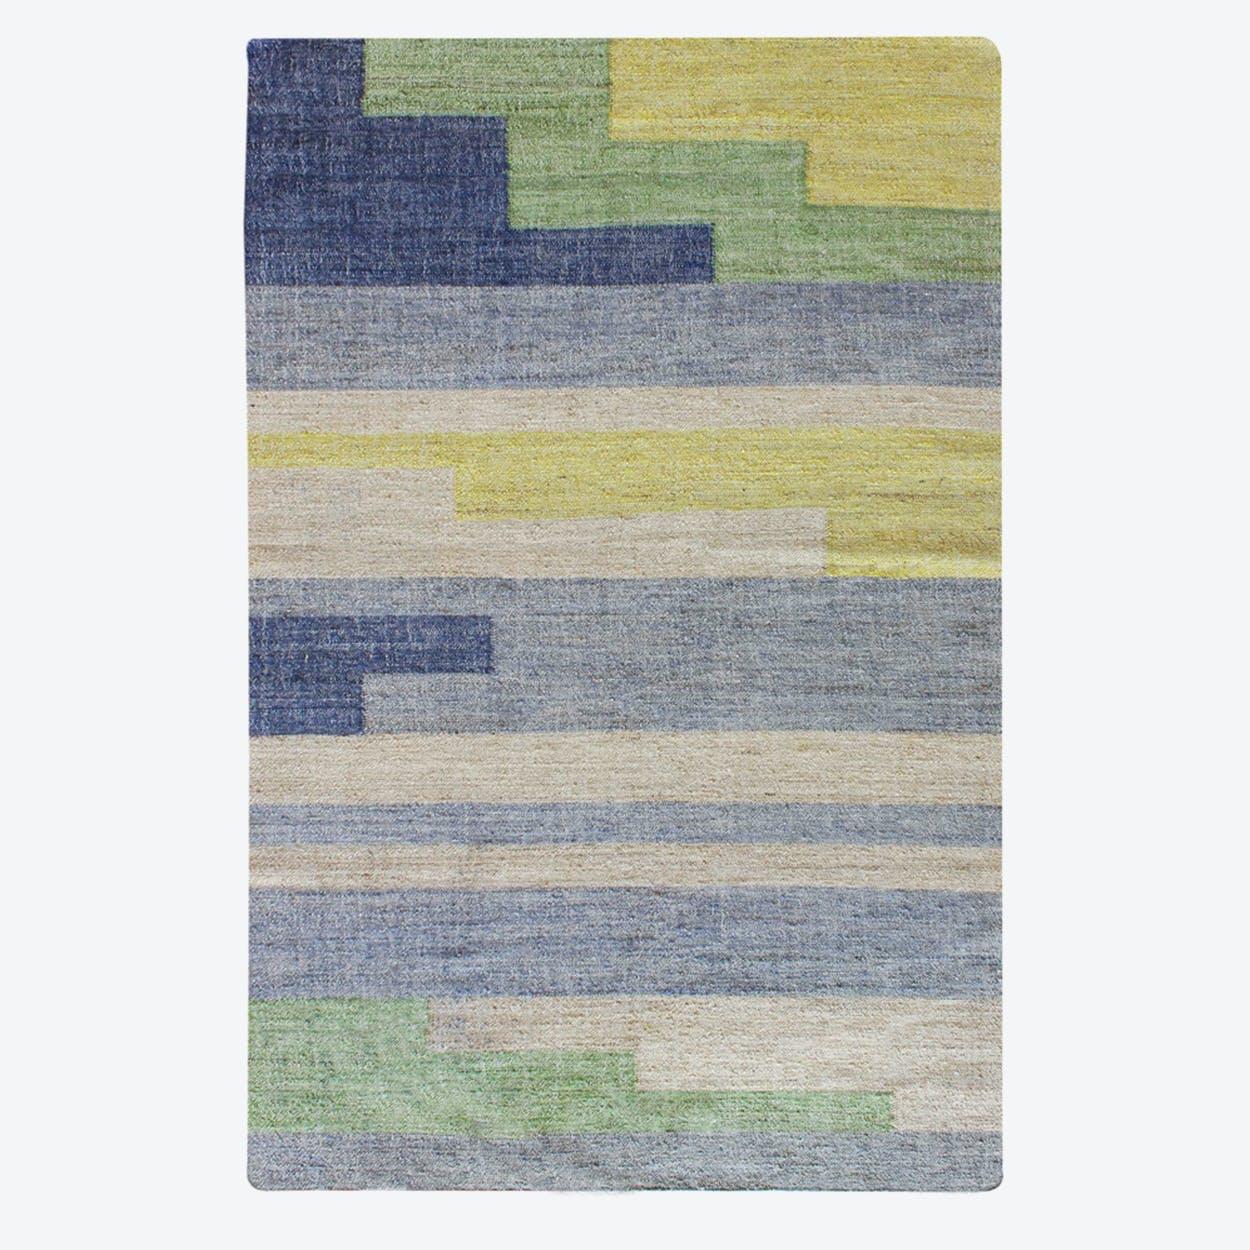 ORSMAN Rug in Earth Tones(160x230)